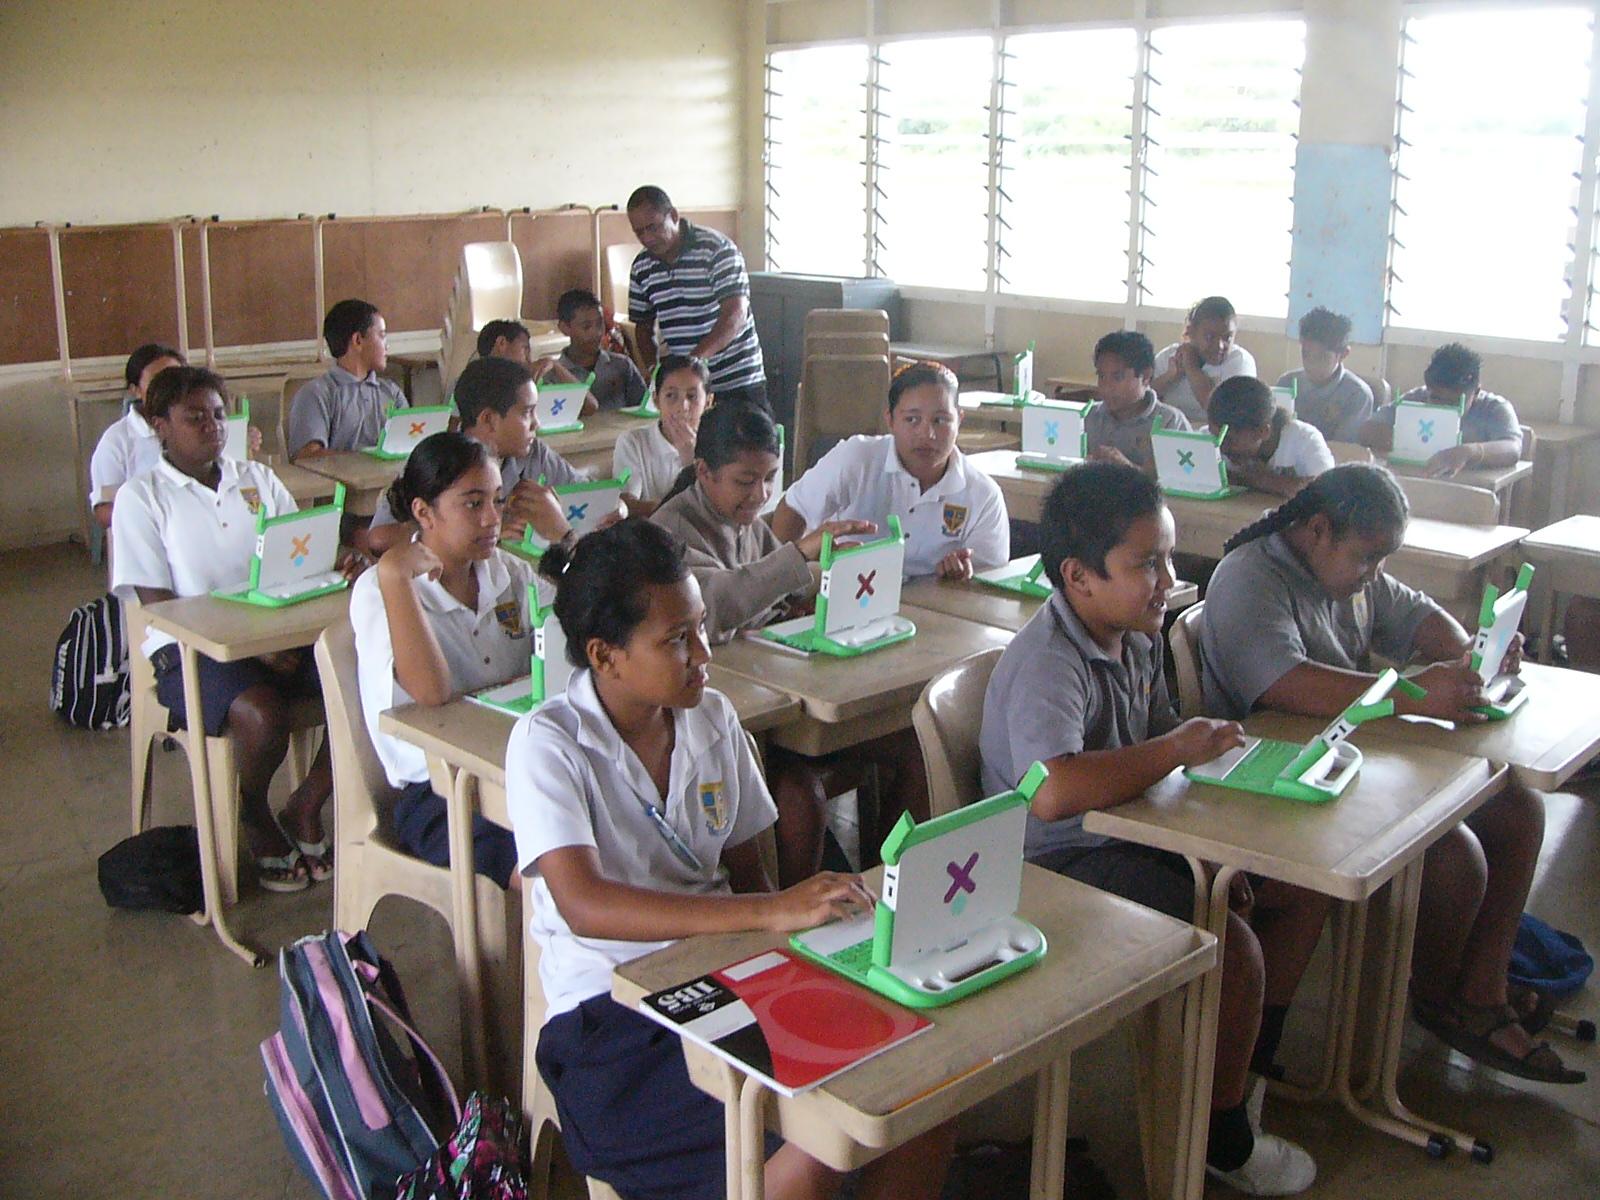 classroom - photo #18